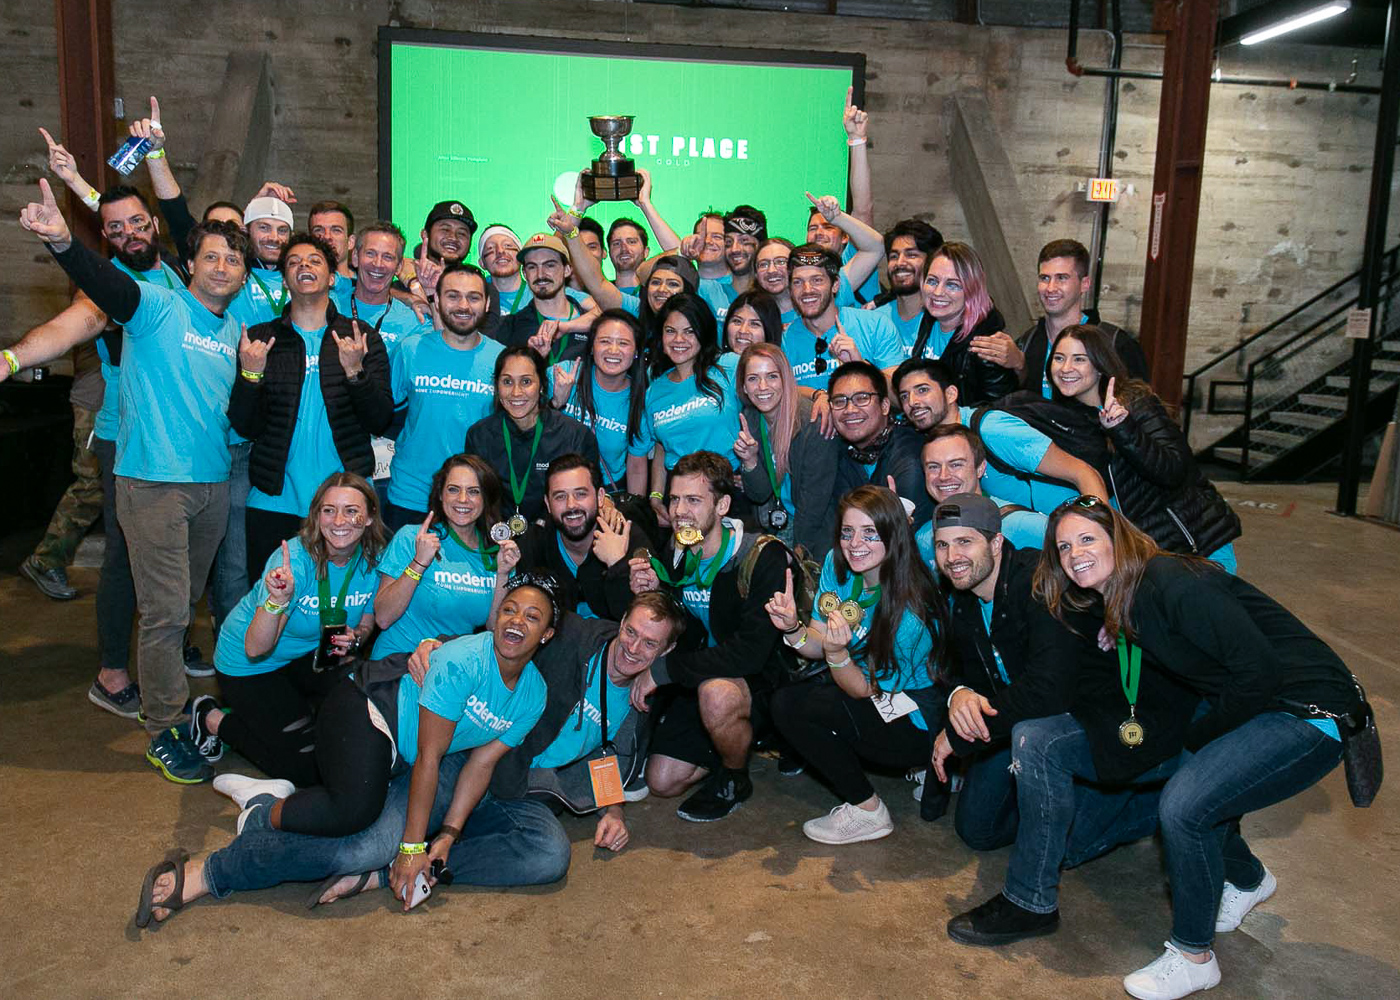 modernize_wins_startupgamesaustin